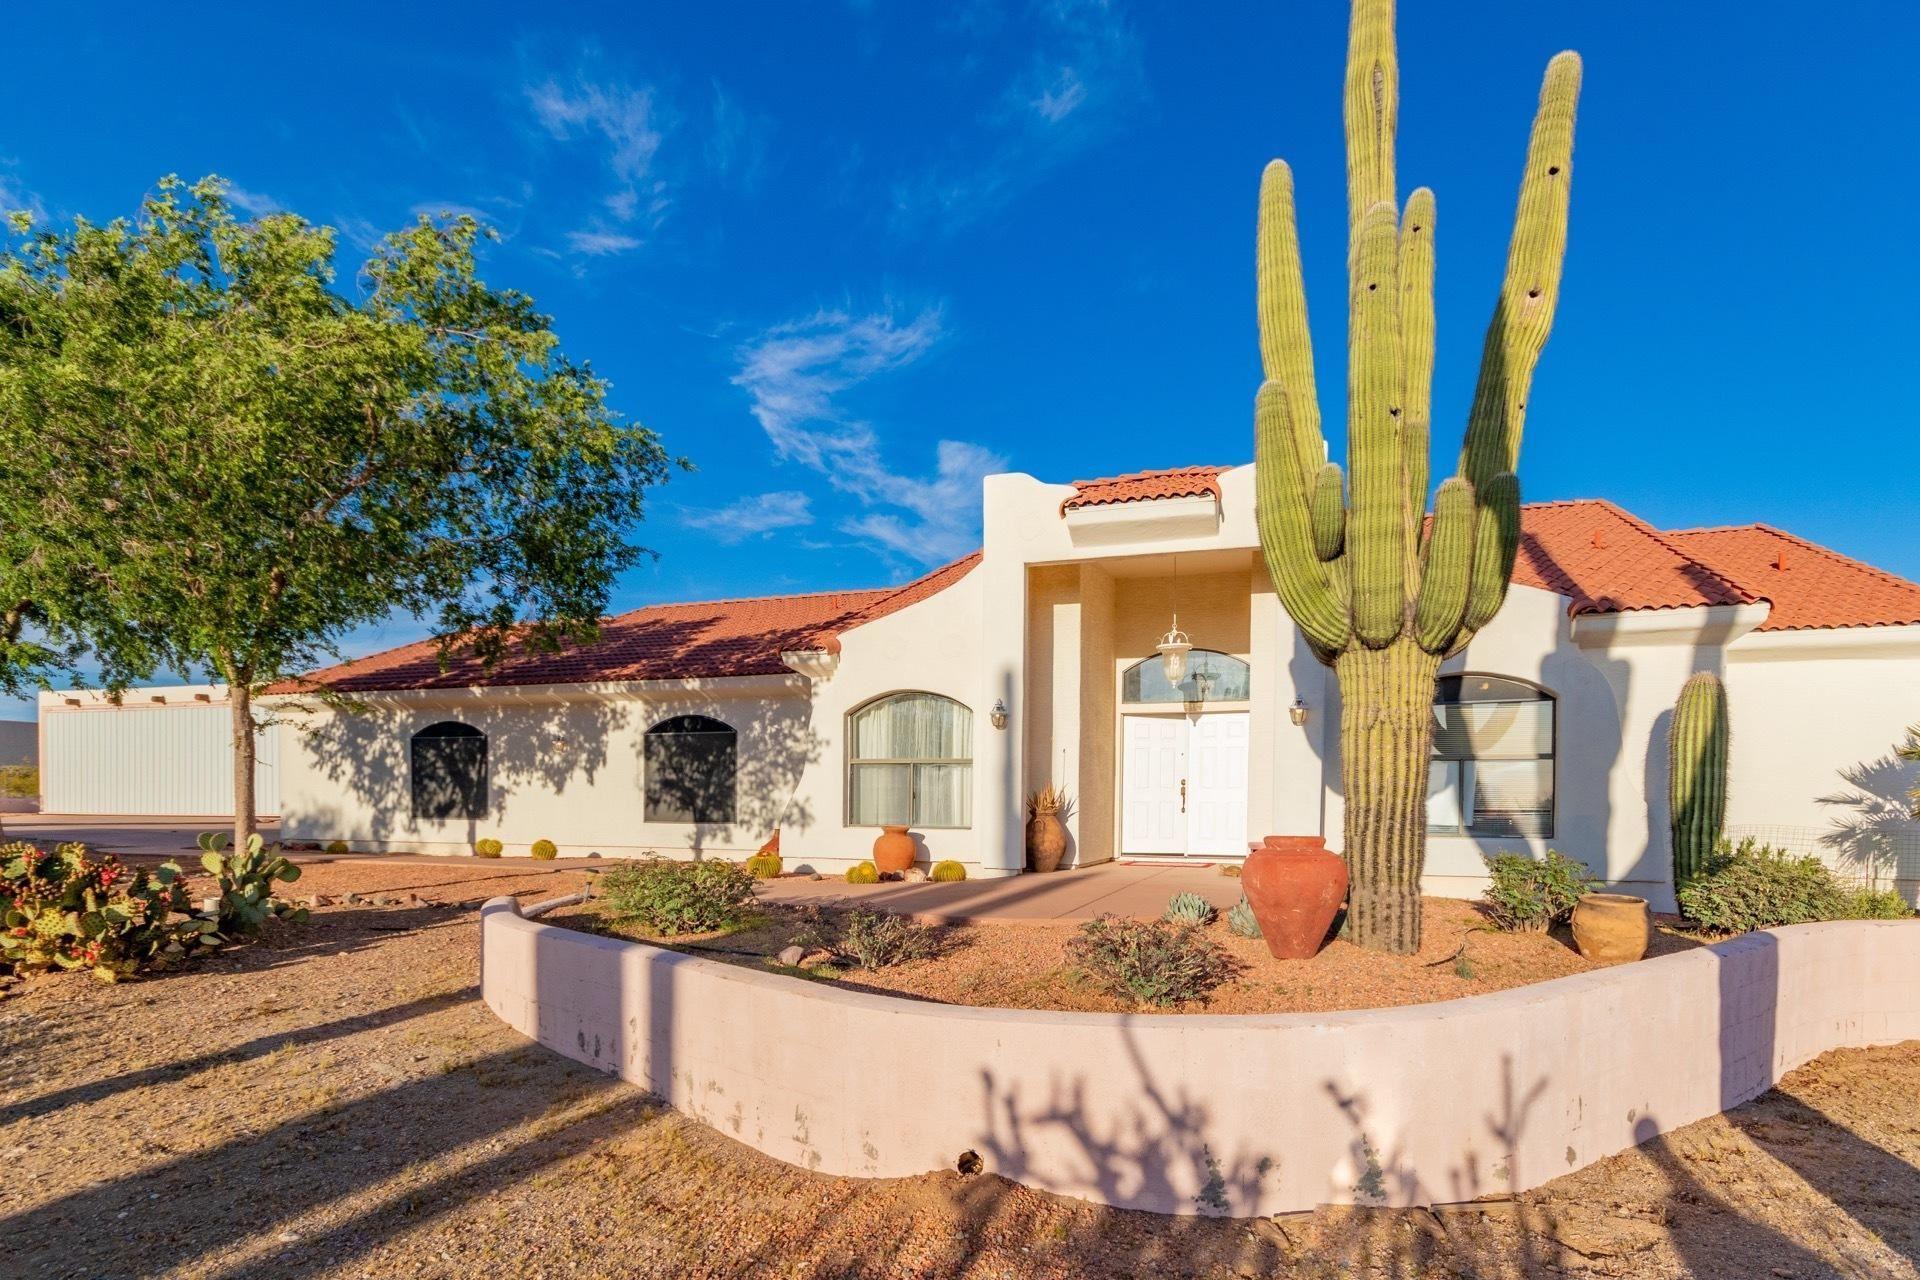 Photo of 37529 N 237TH Avenue, Morristown, AZ 85342 (MLS # 6217923)